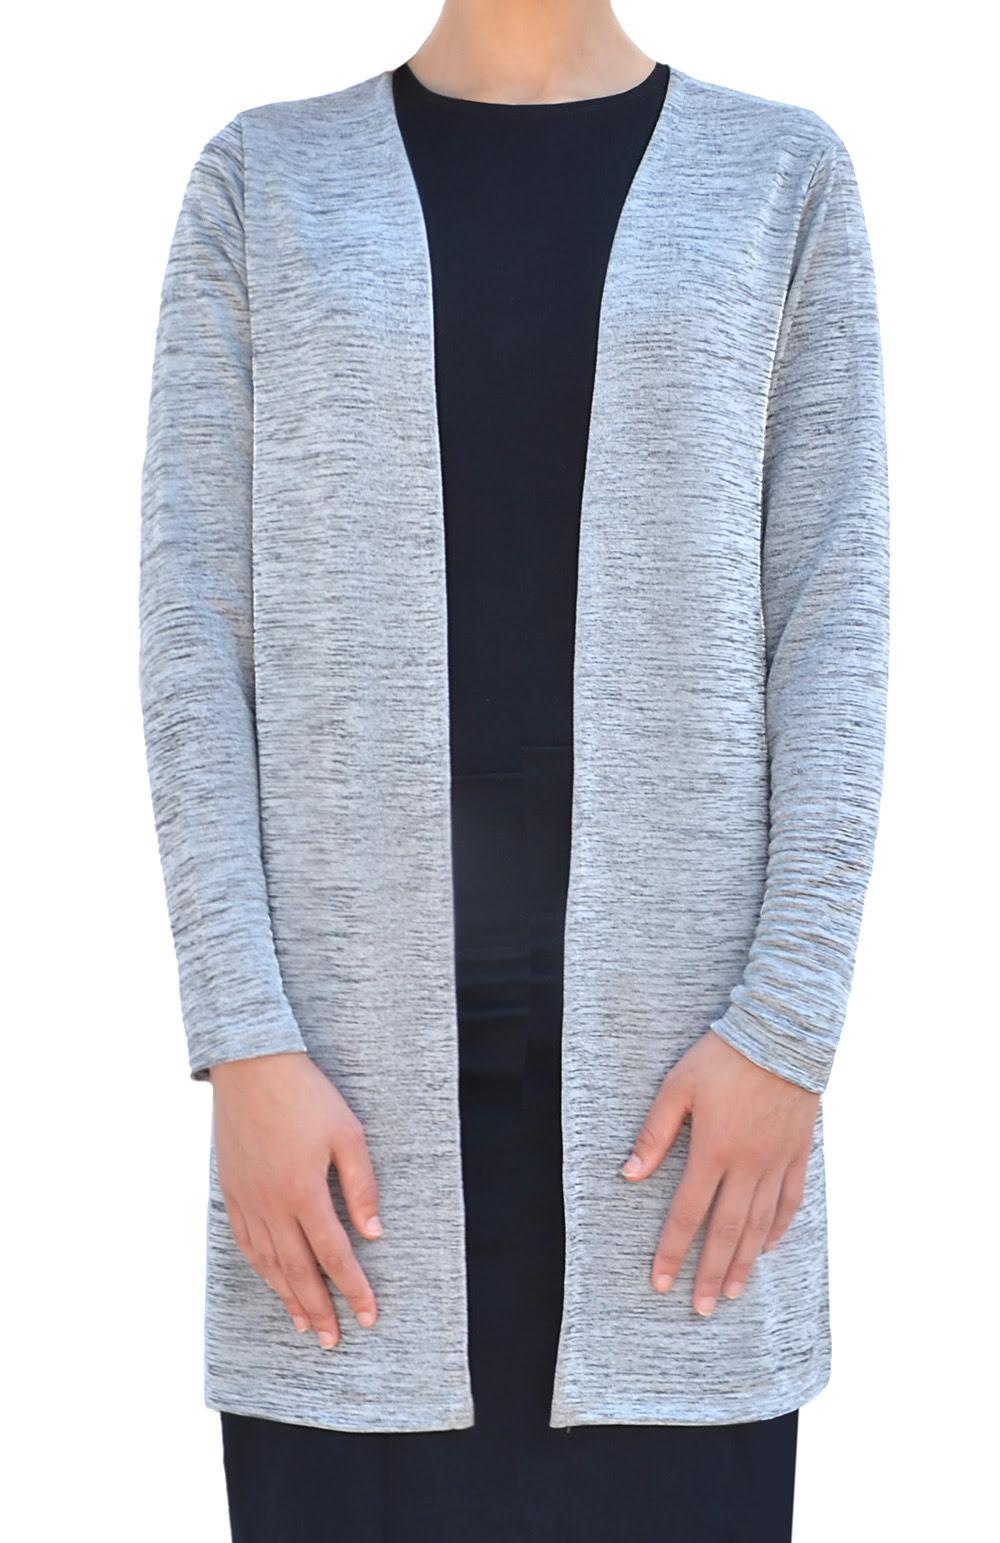 Sleevies sleeve extensions. Kosher Casual.